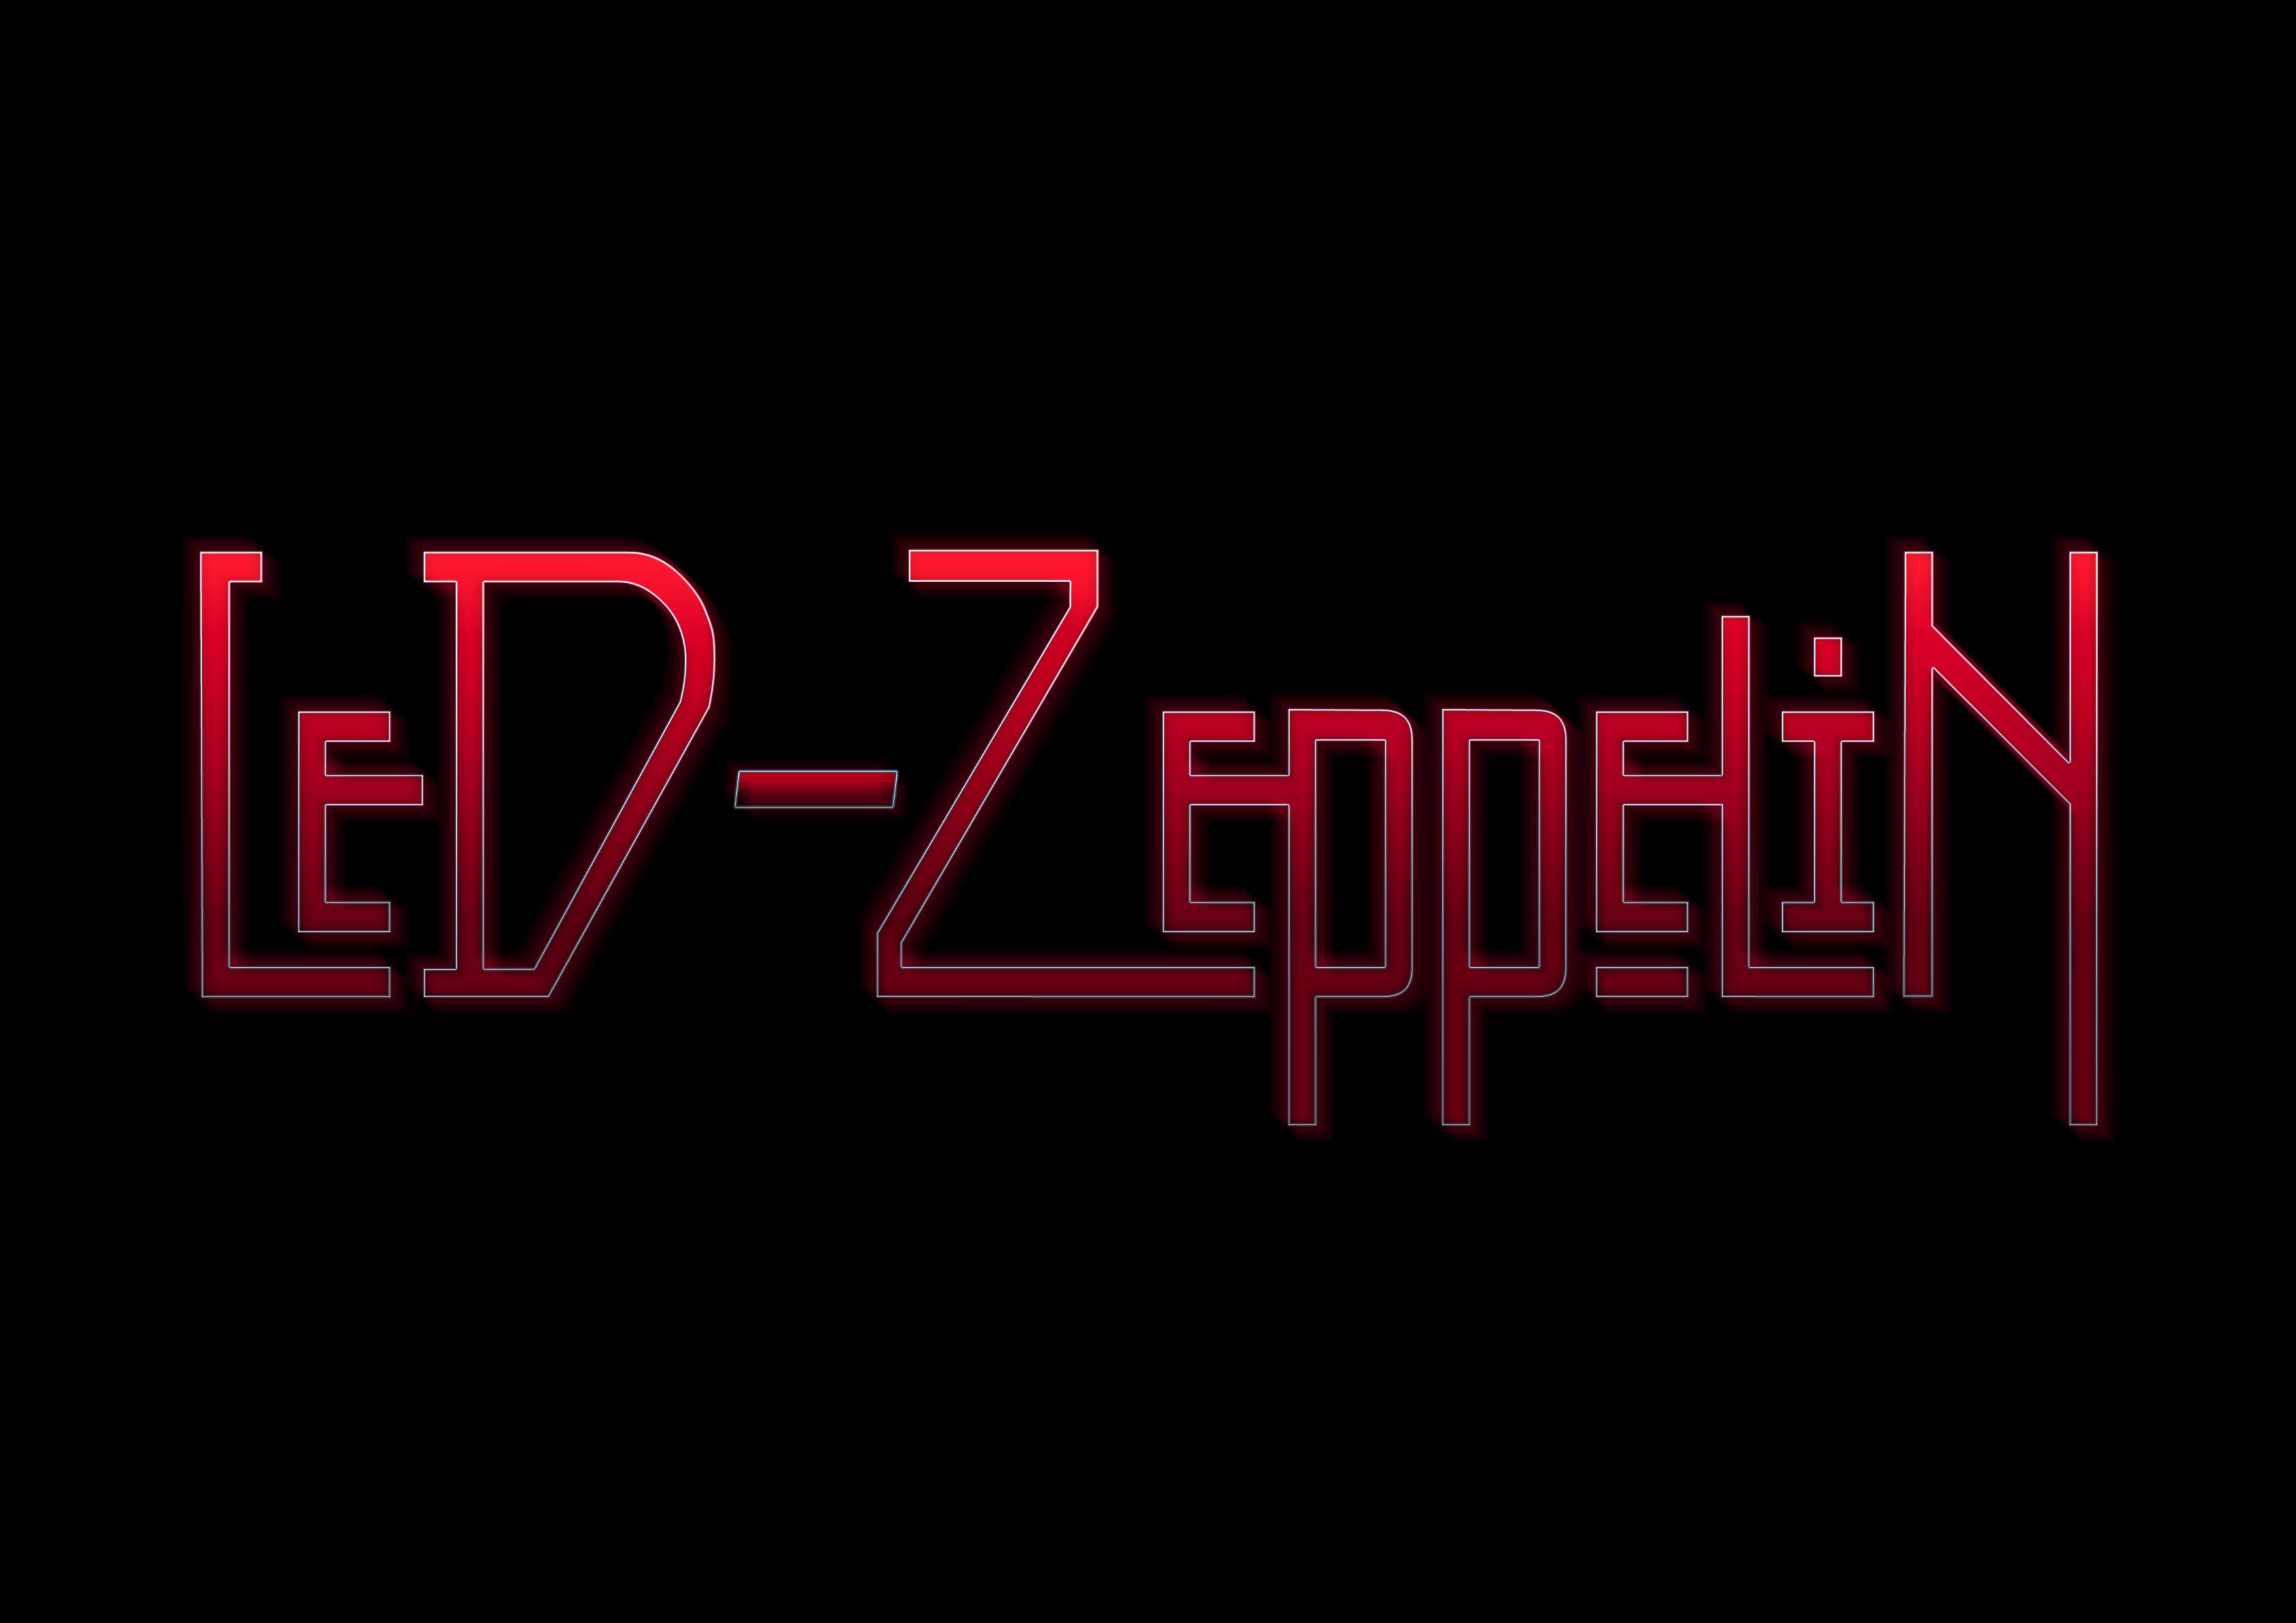 Led Zeppelin Logos